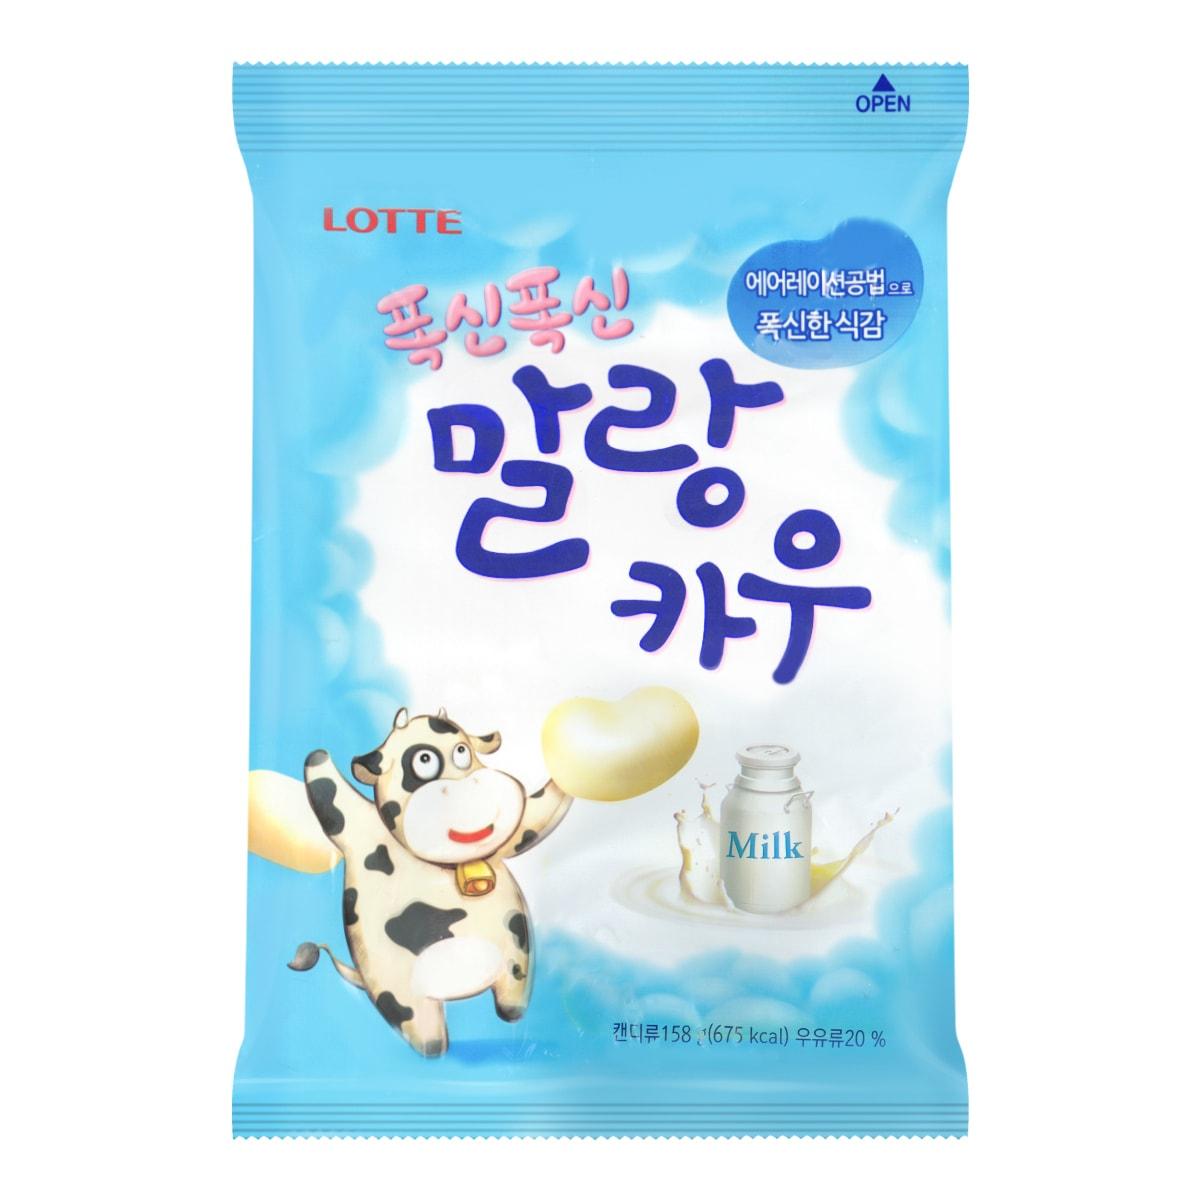 LOTTE MALANG COW Milk Candy Original Flavor 158g